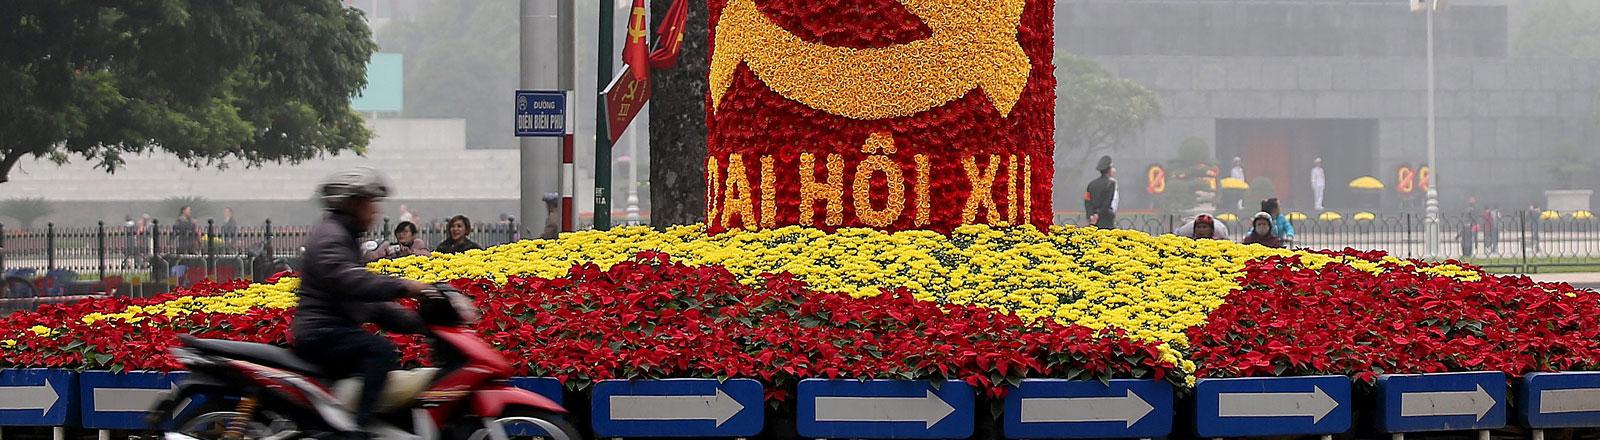 Hanoi Vietnam Verkehr